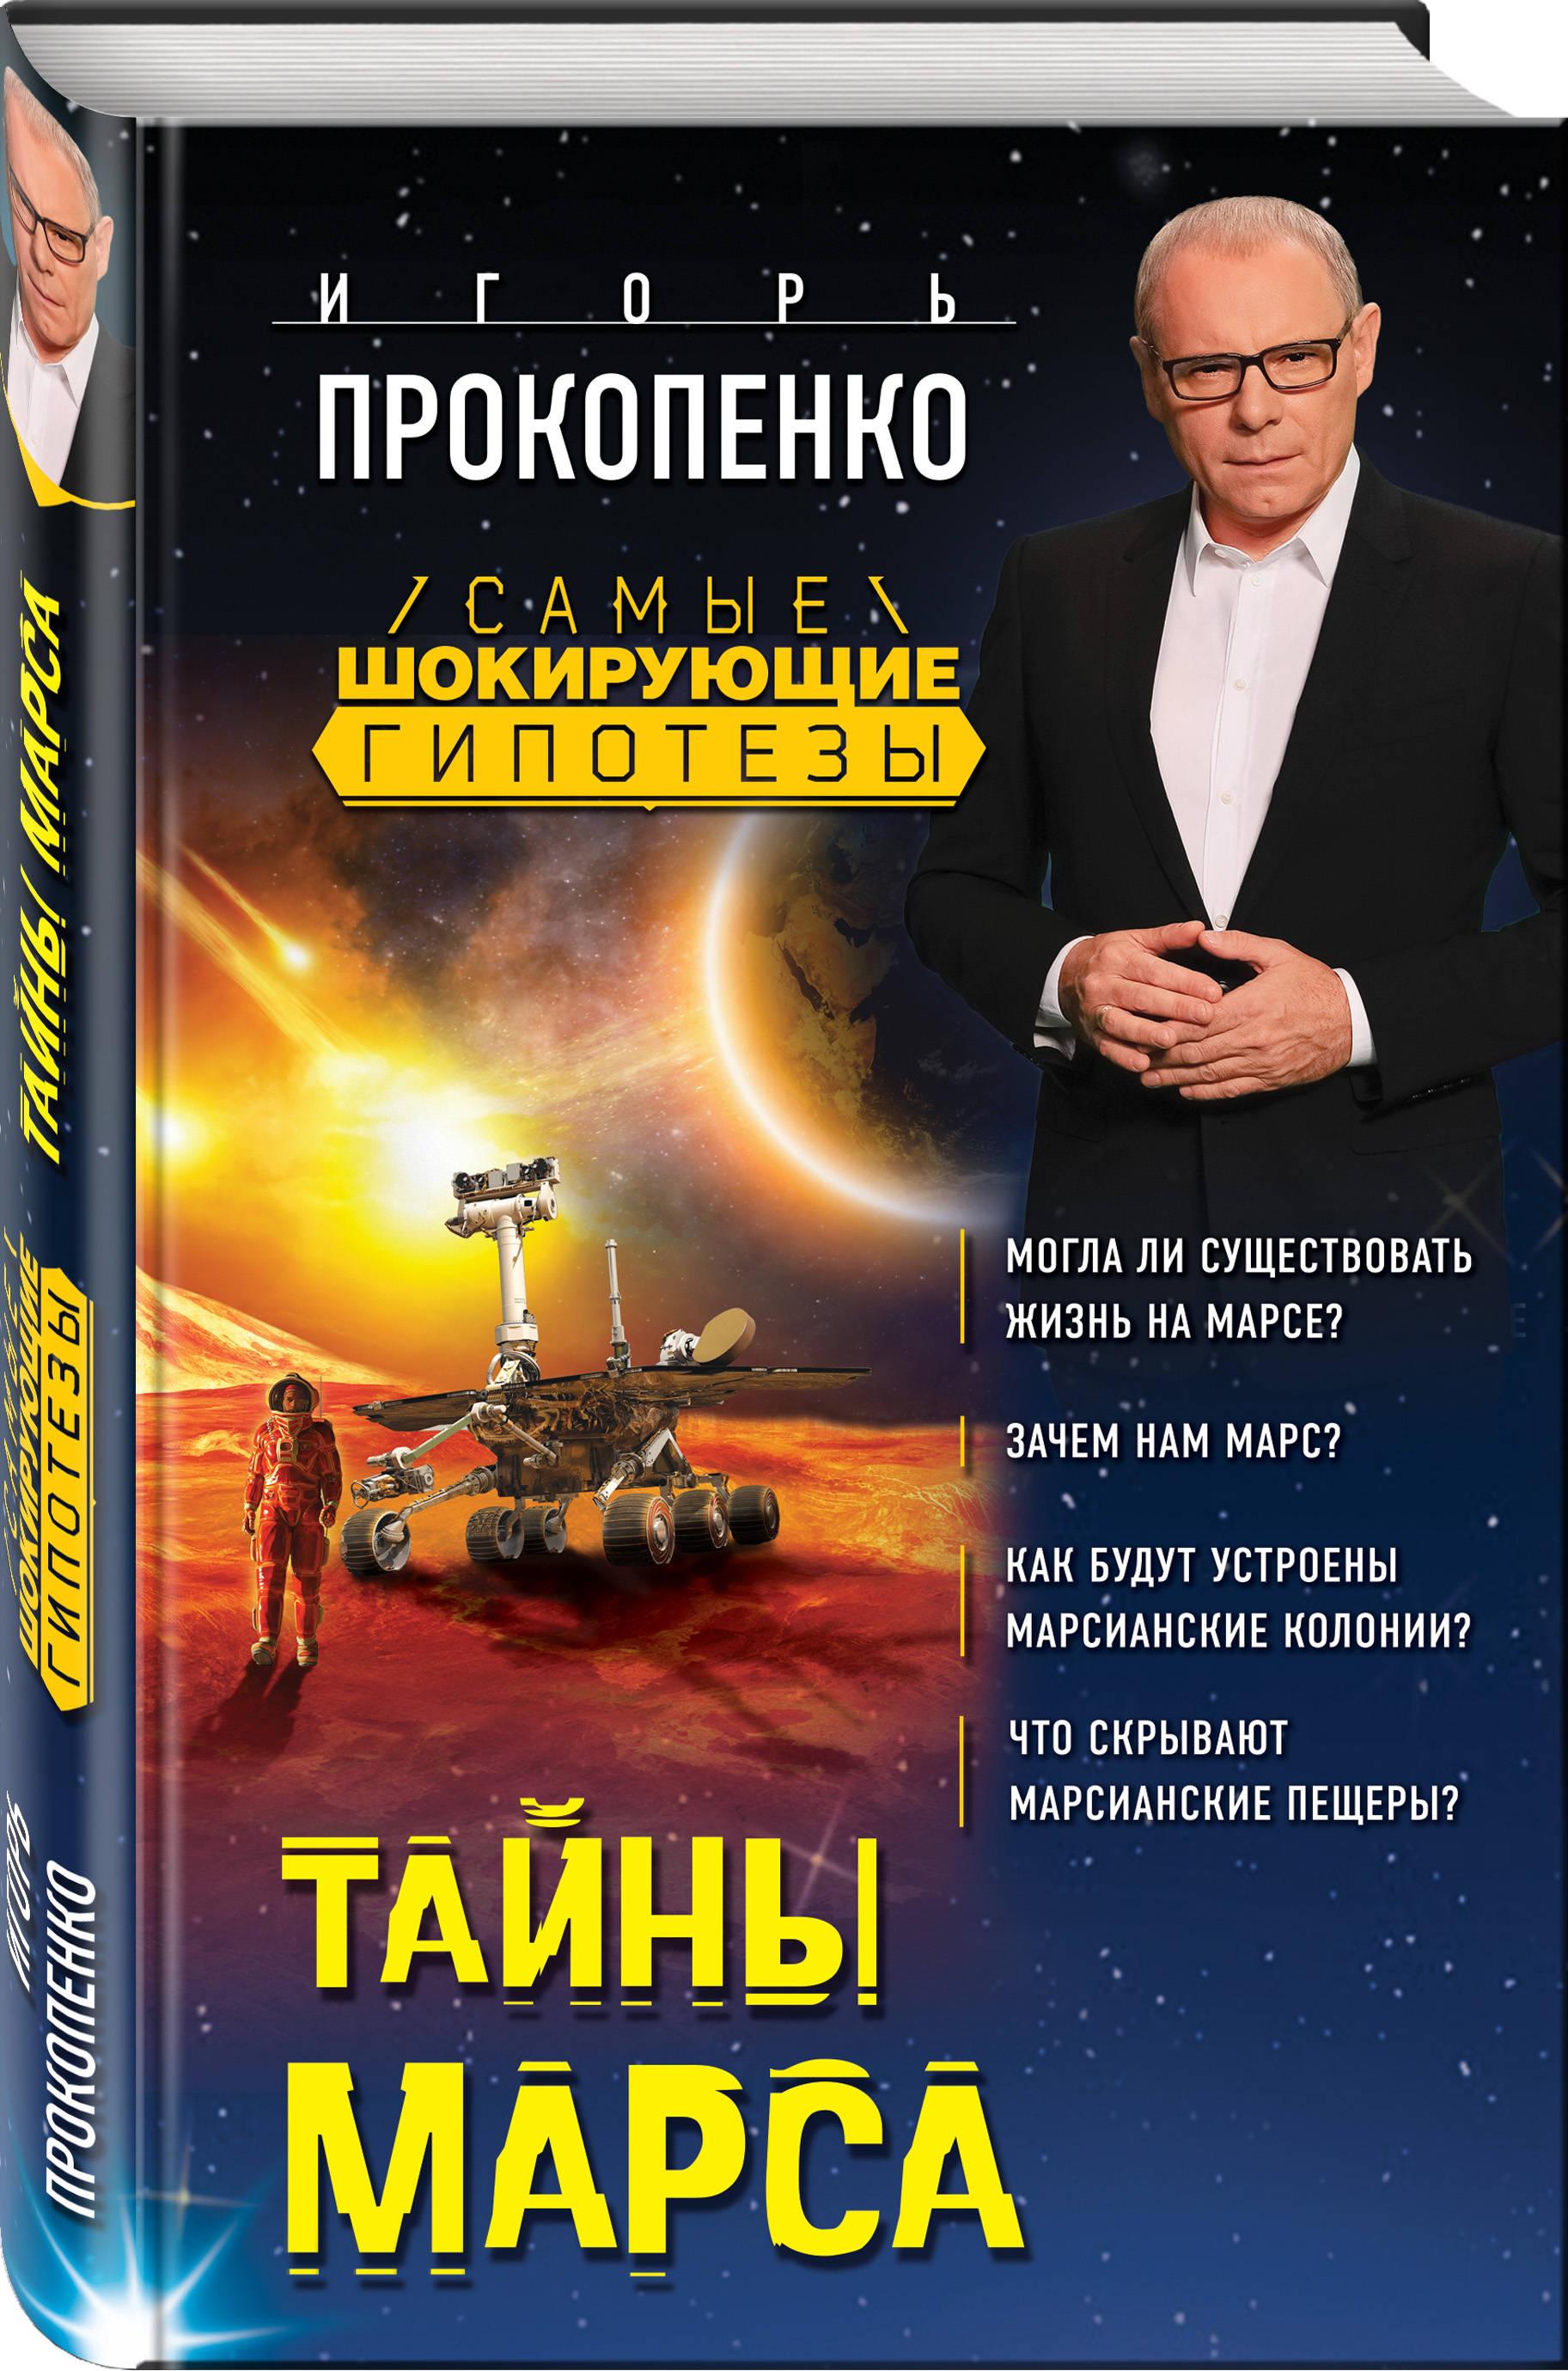 Игорь Прокопенко Тайны Марса солнце луна марс прокопенко и с